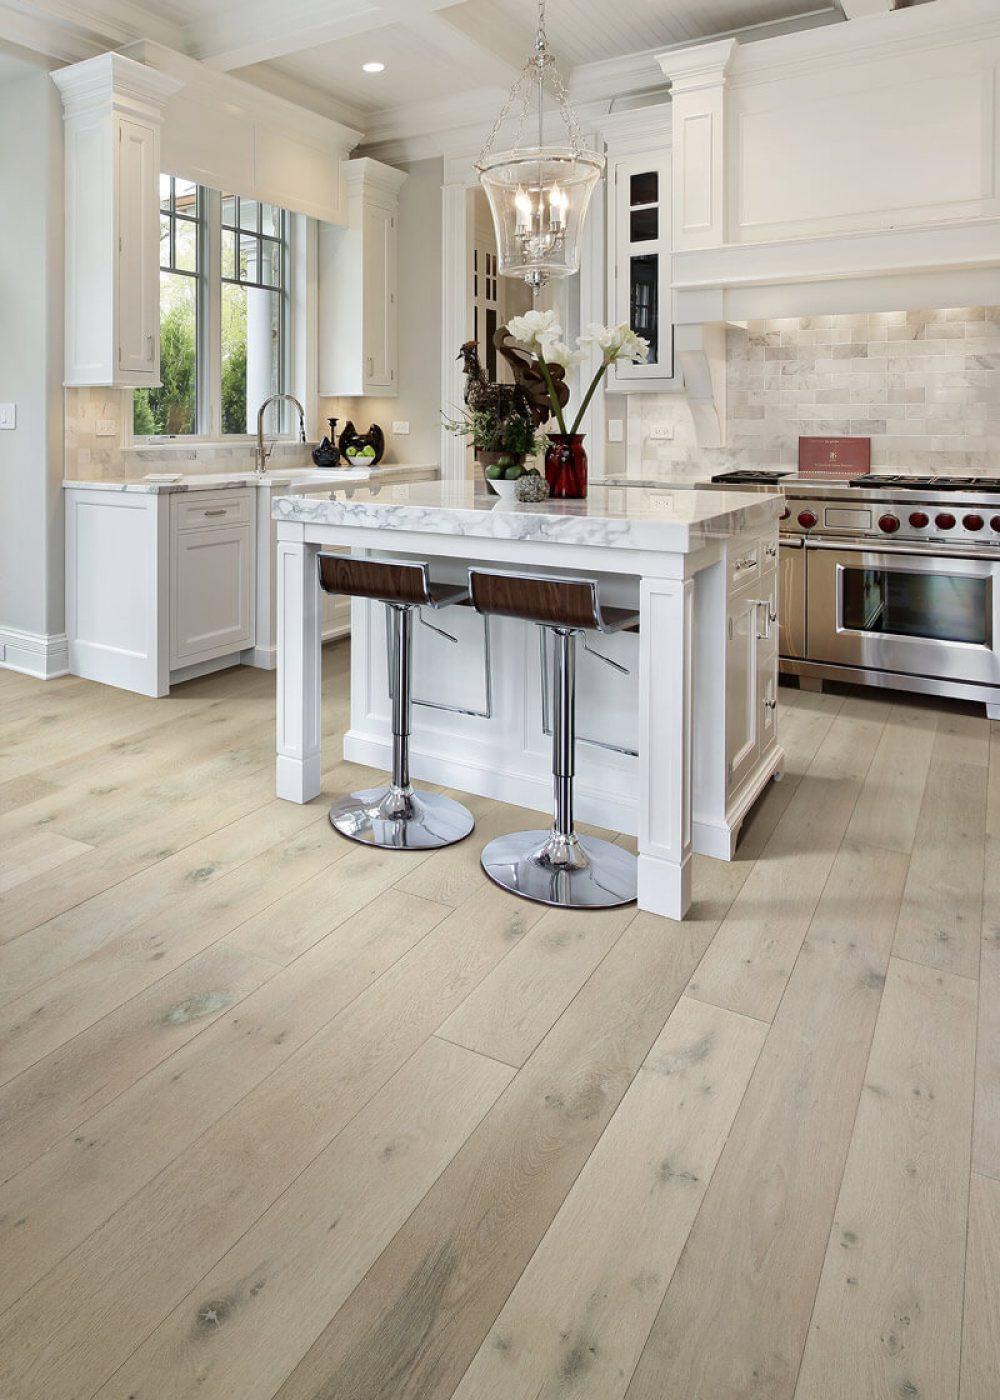 bostik best glue hardwood flooring adhesive of porcelain hardwood flooring white oak flooring heathwood floors with character classification natural grade